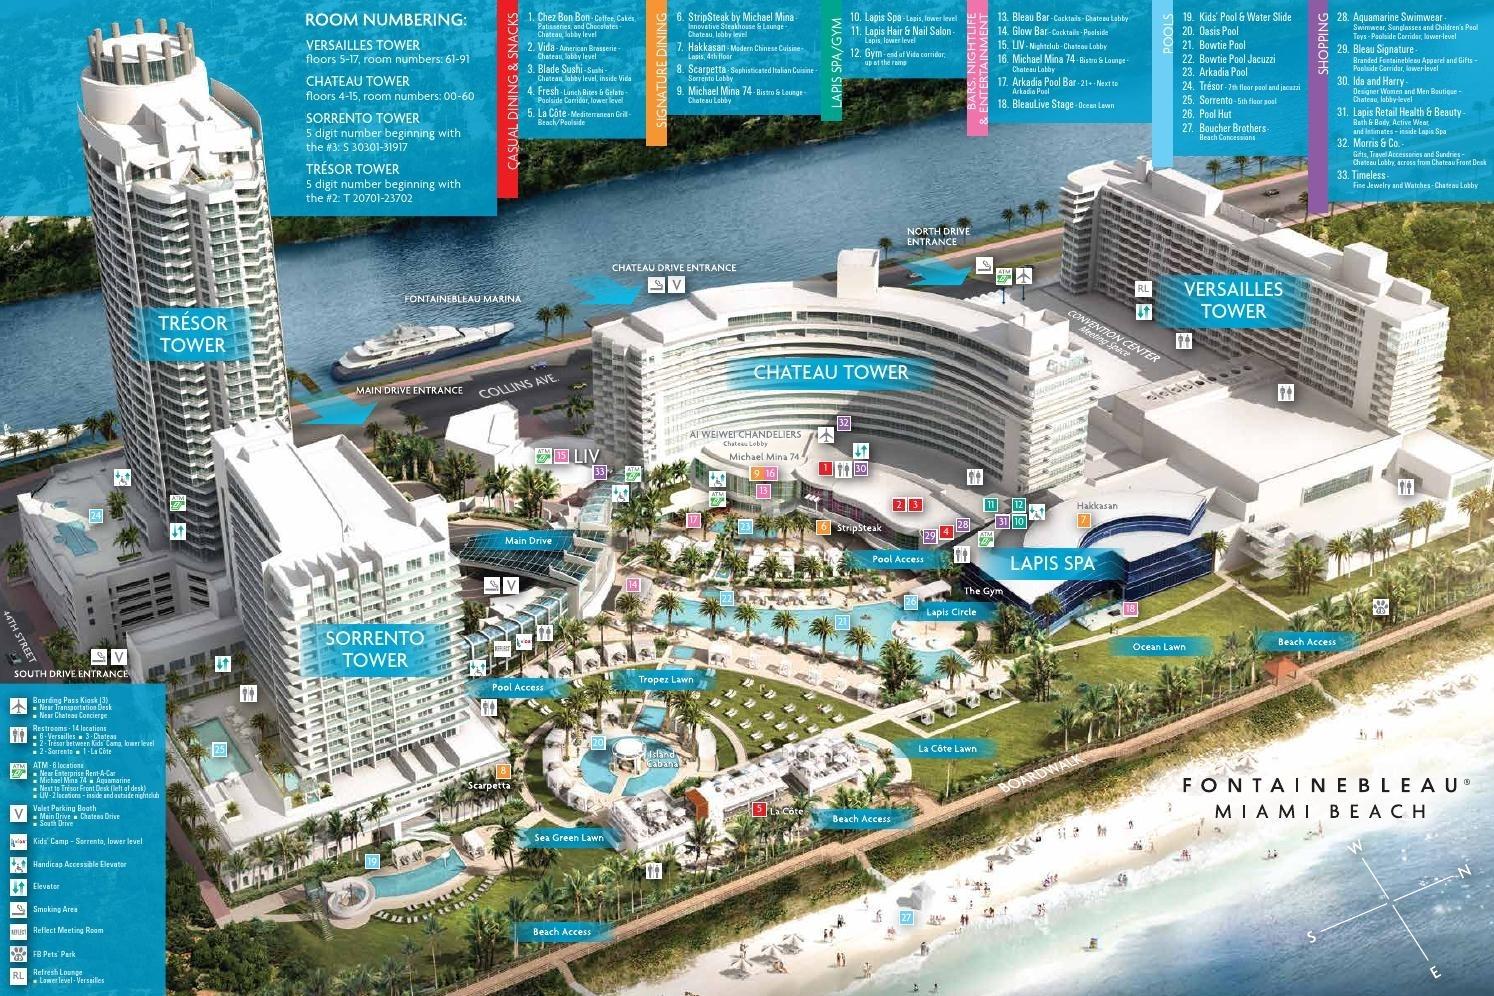 Property Mapfontainebleau Miami Beach - Issuu with Fontainebleau Miami Beach Map